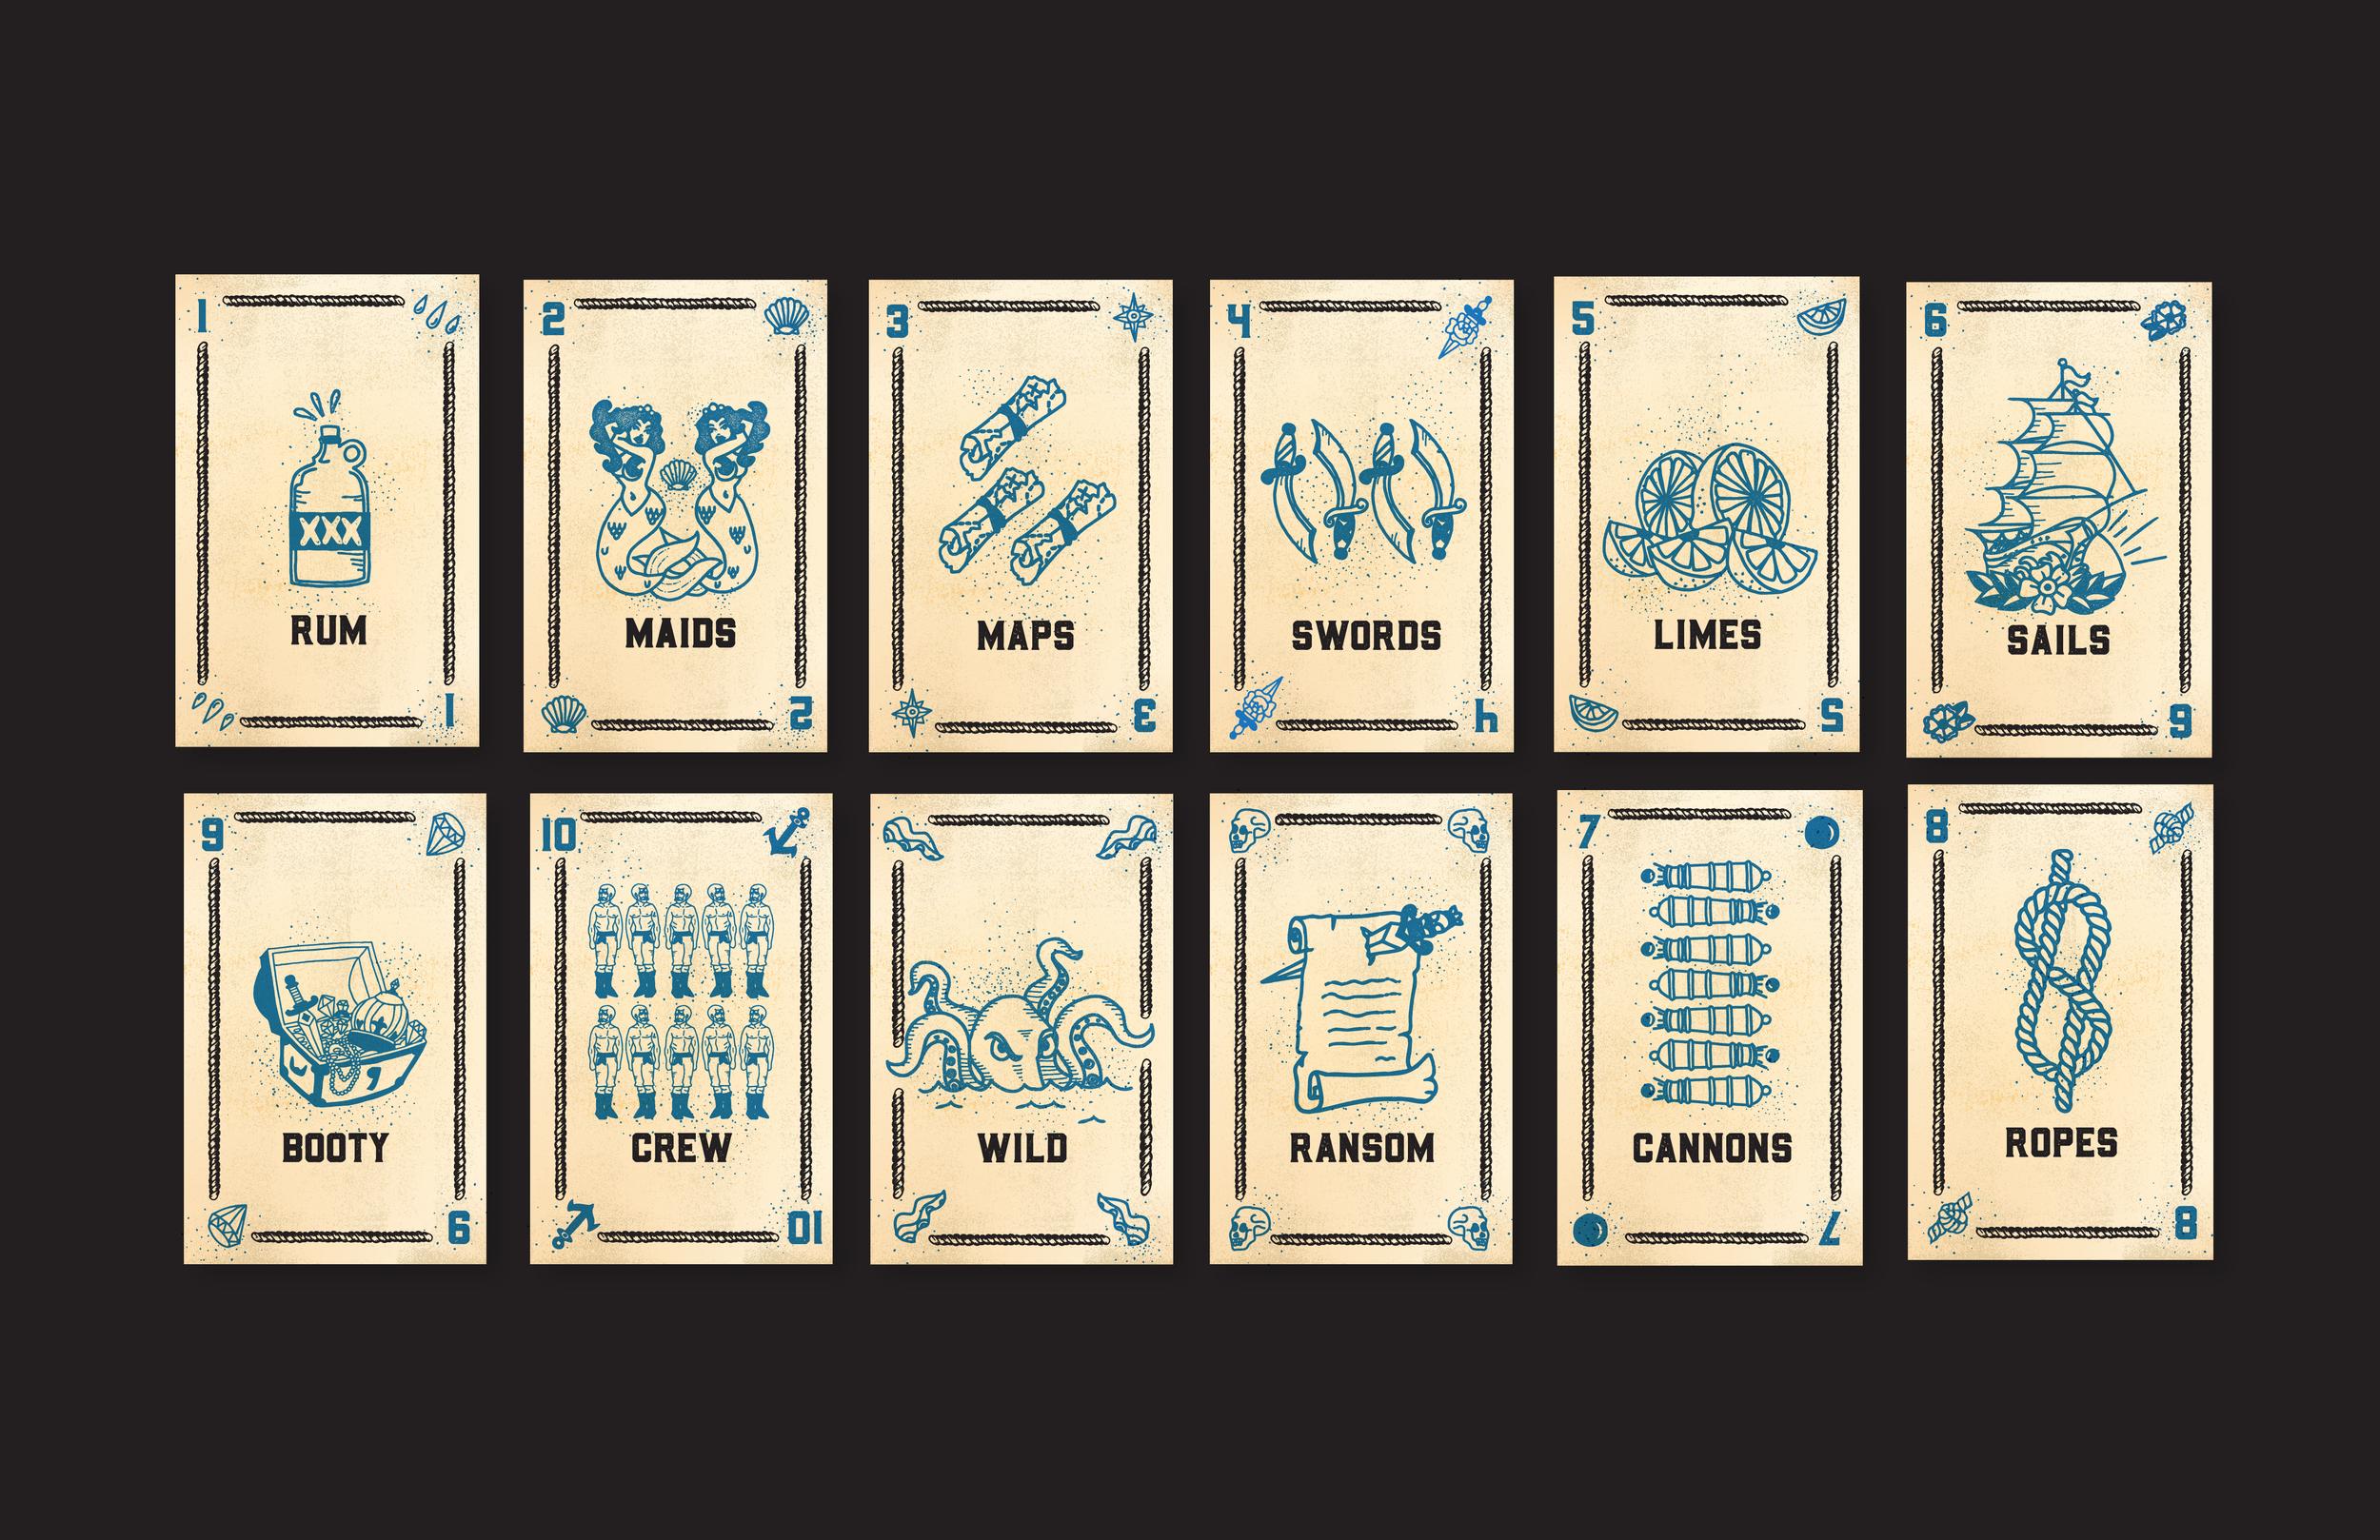 PiratesCode_Cards-01.png